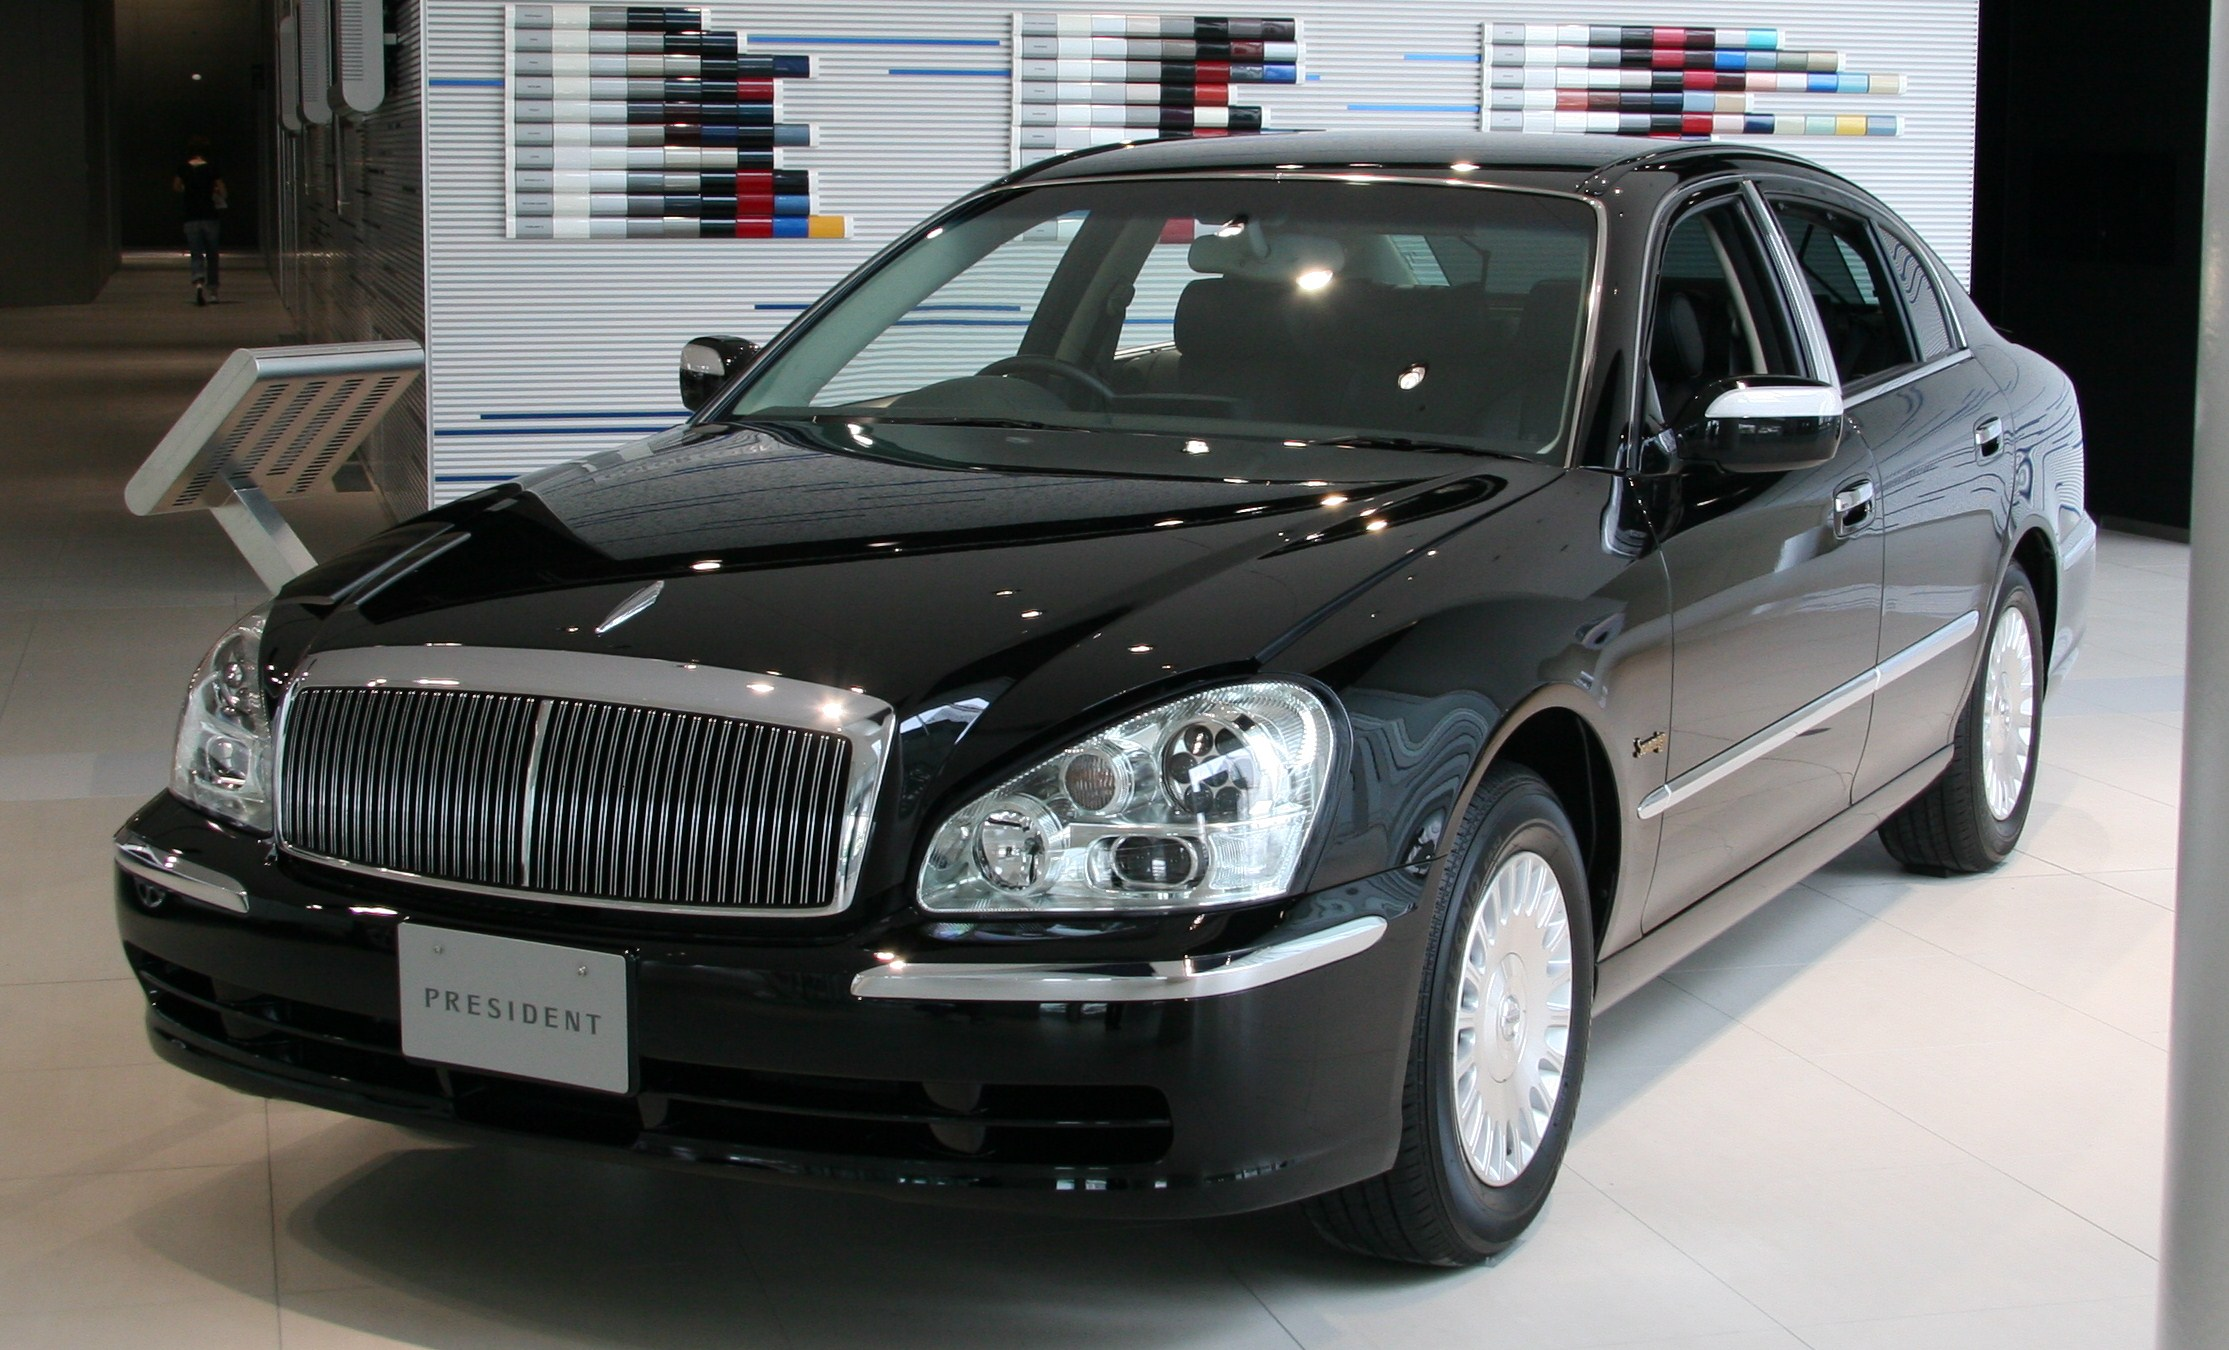 Nissan Luxury Brand >> Nissan President Wikipedia